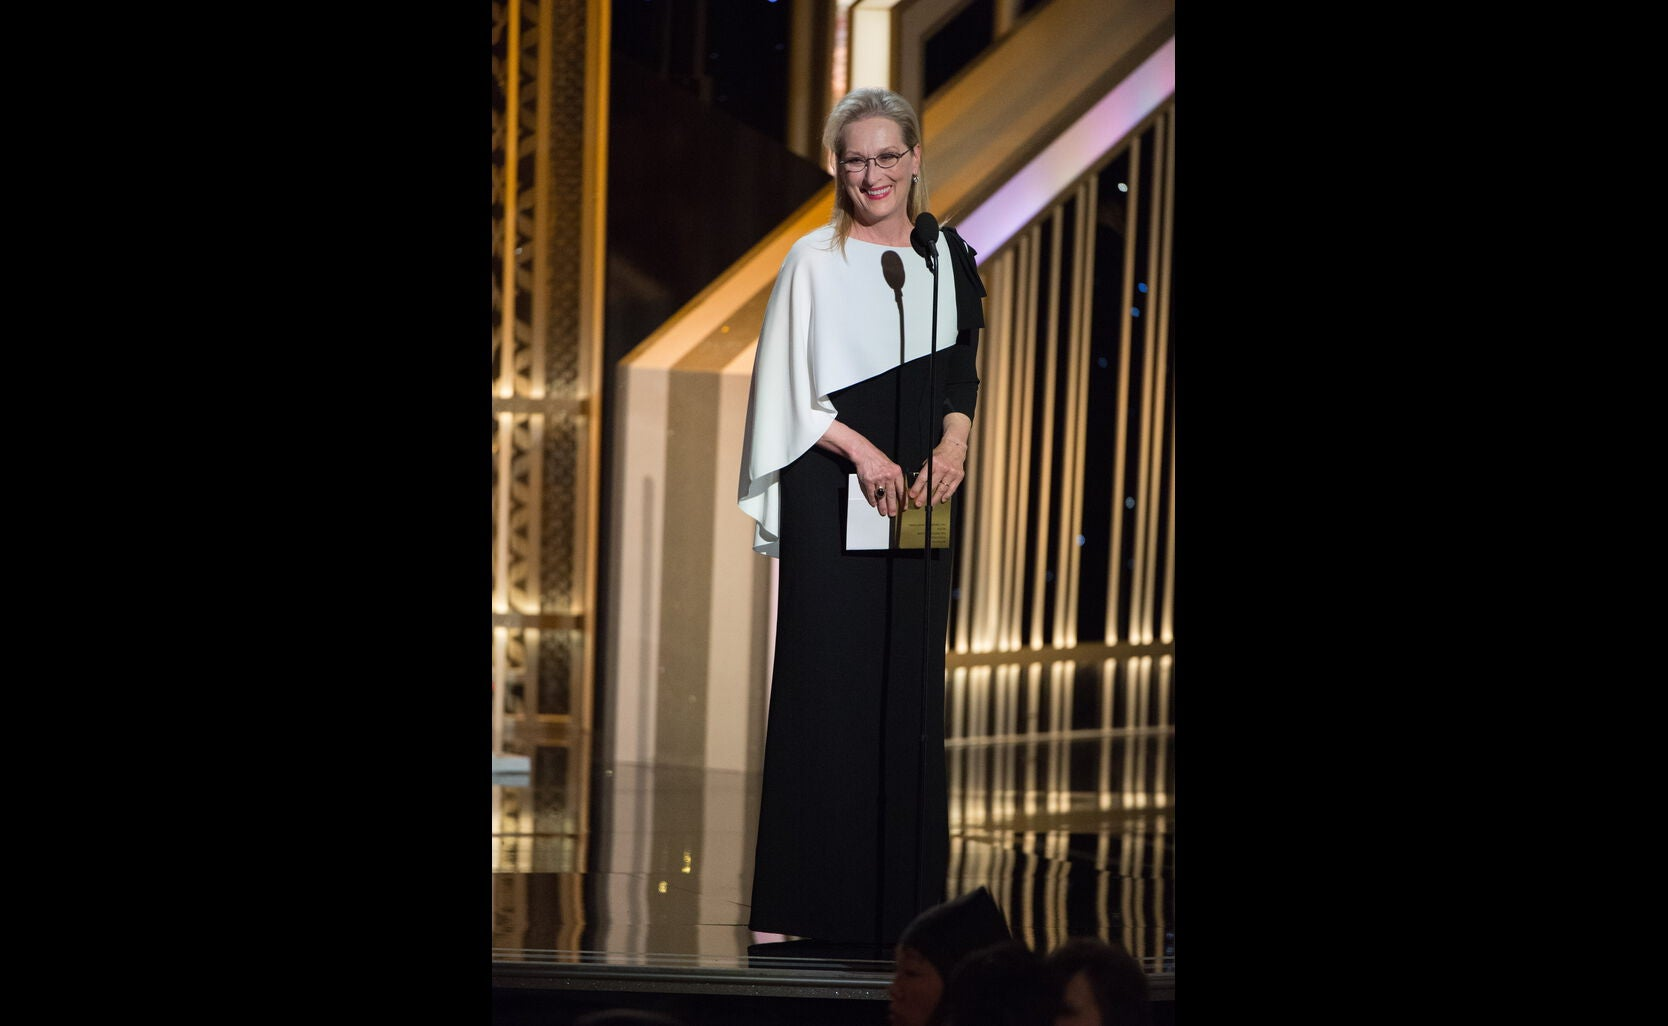 Actress Meryl Streep, Golden Globe winner, presenting in 2015